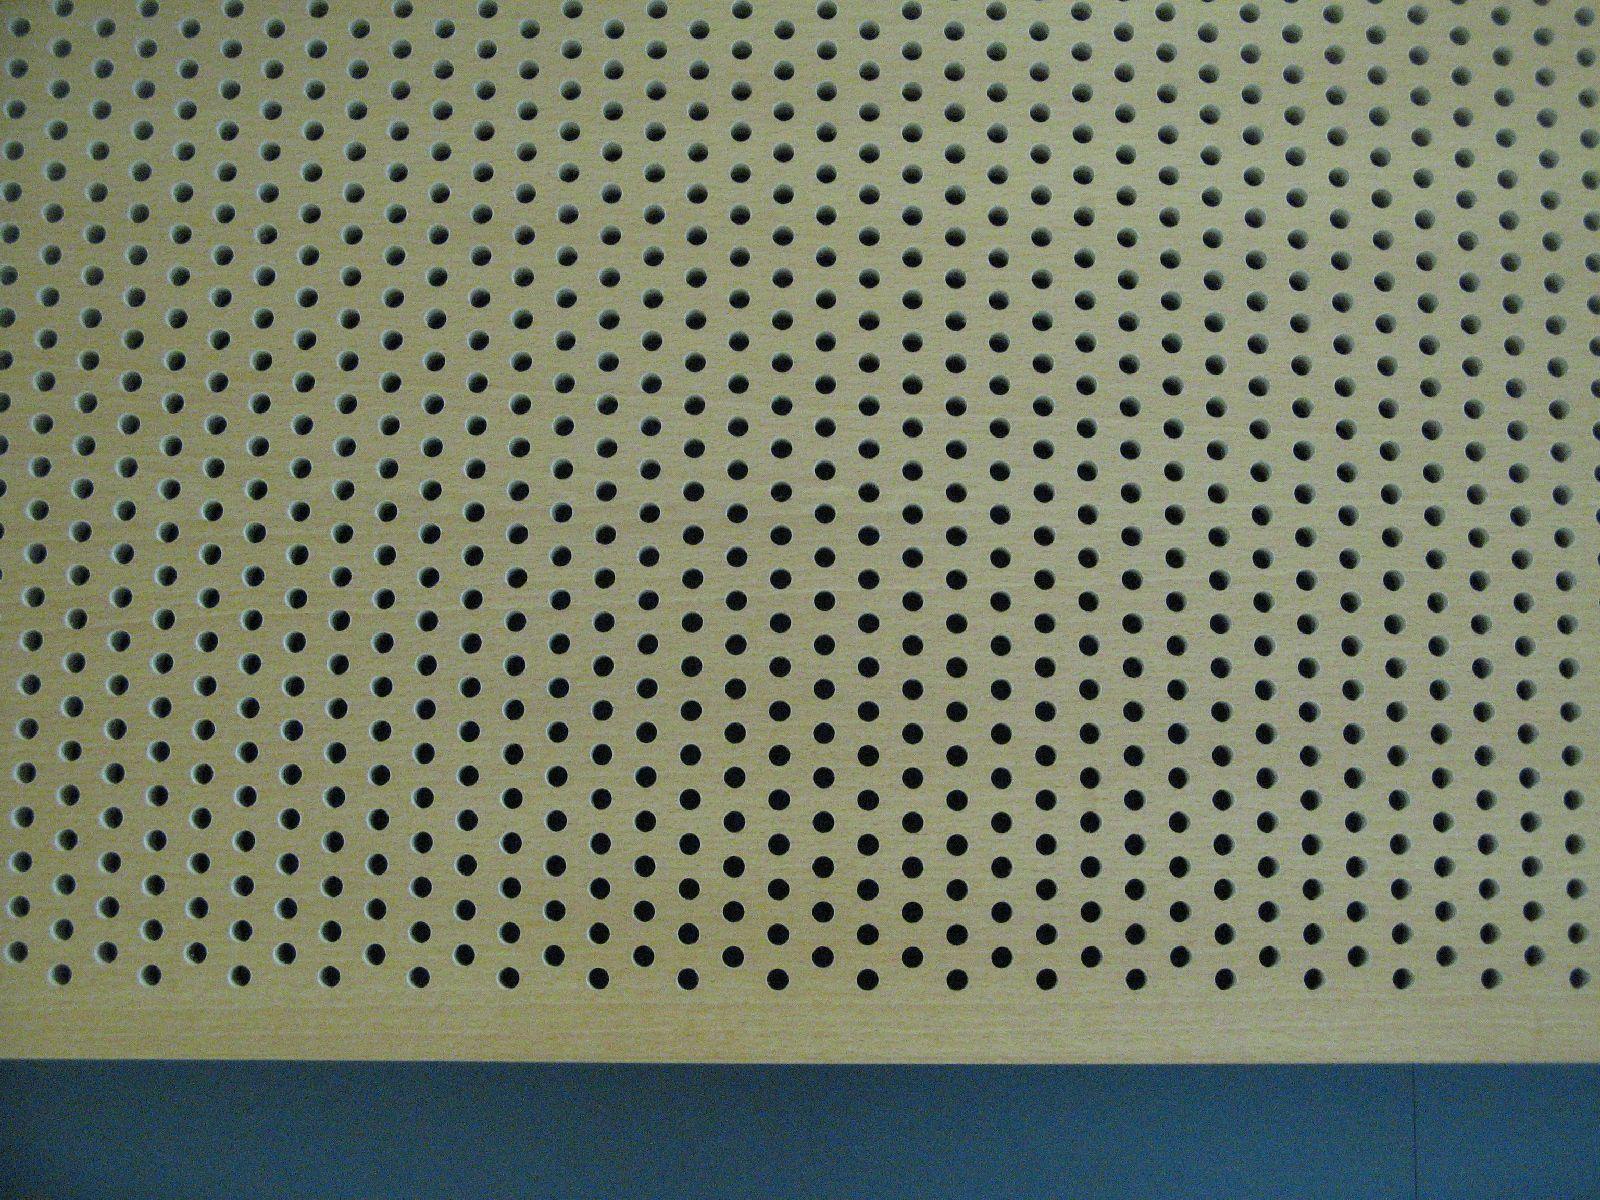 Innenraum-Material_Textur_B_4972